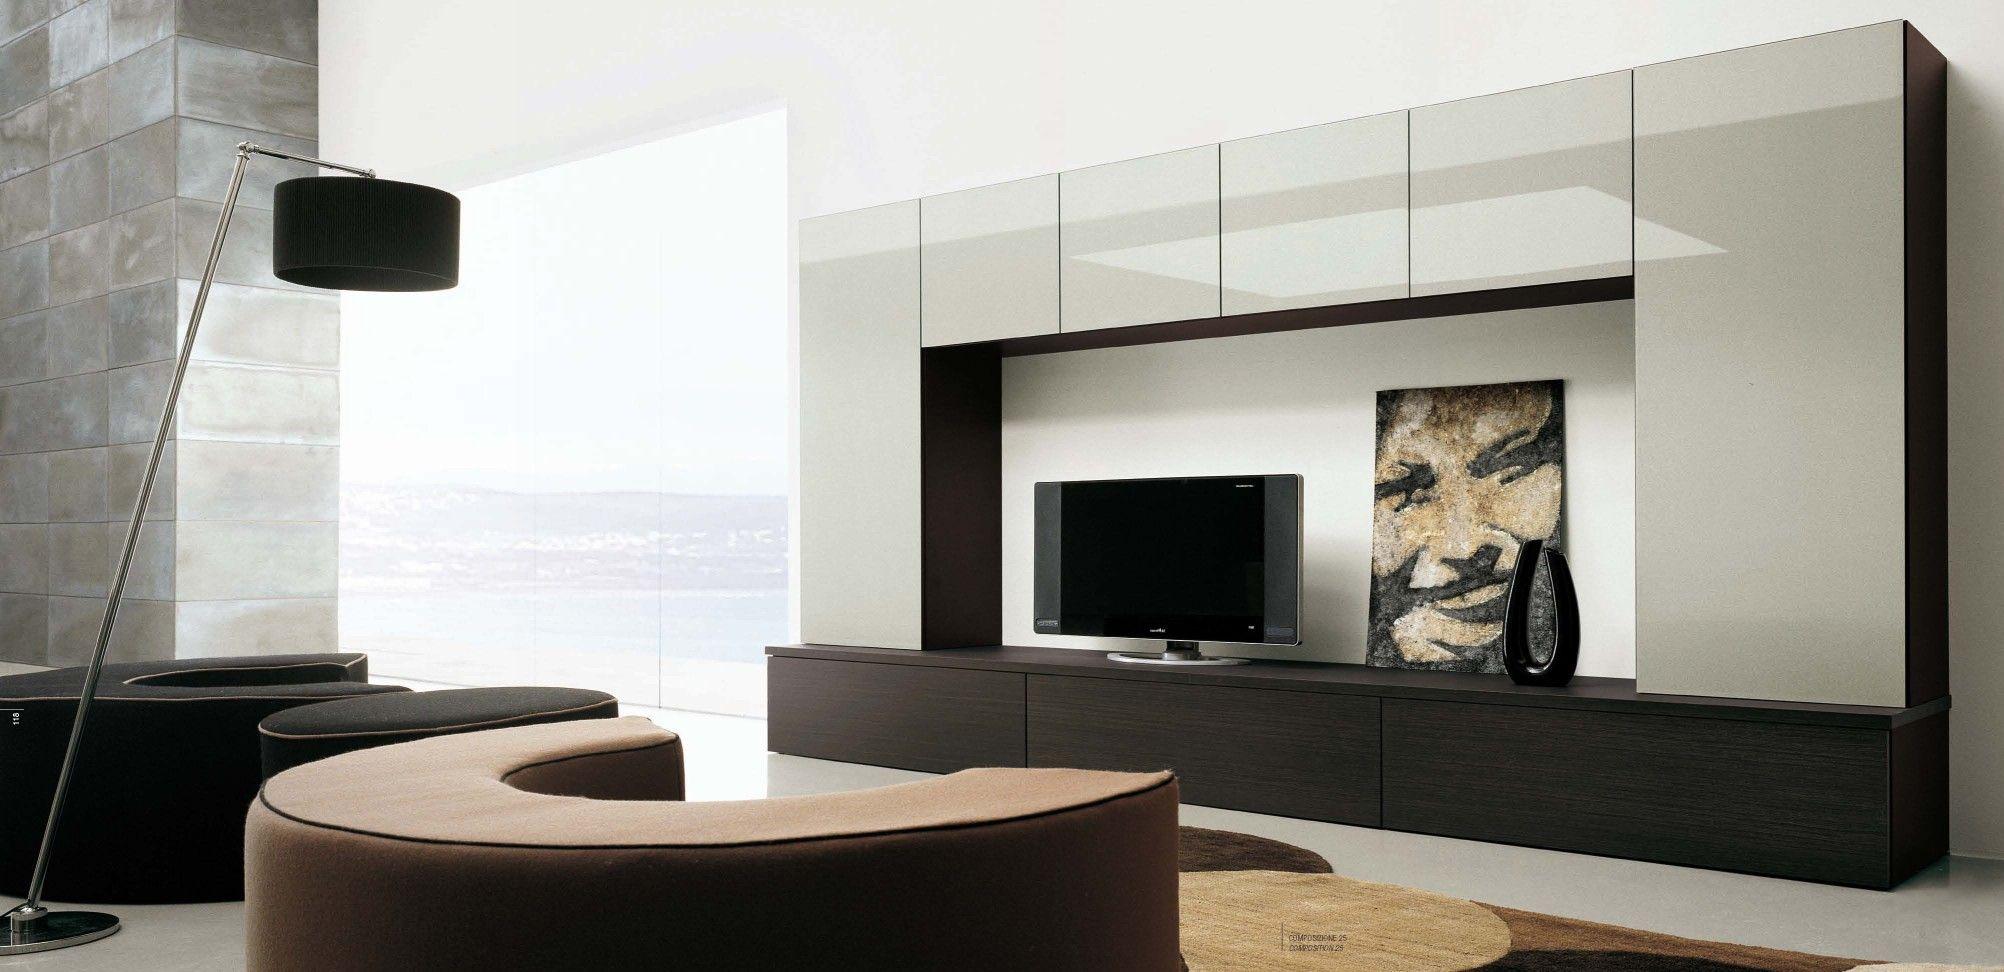 Living Room Entertainment Center Ideas contemporary entertainment center archives - la furniture blog